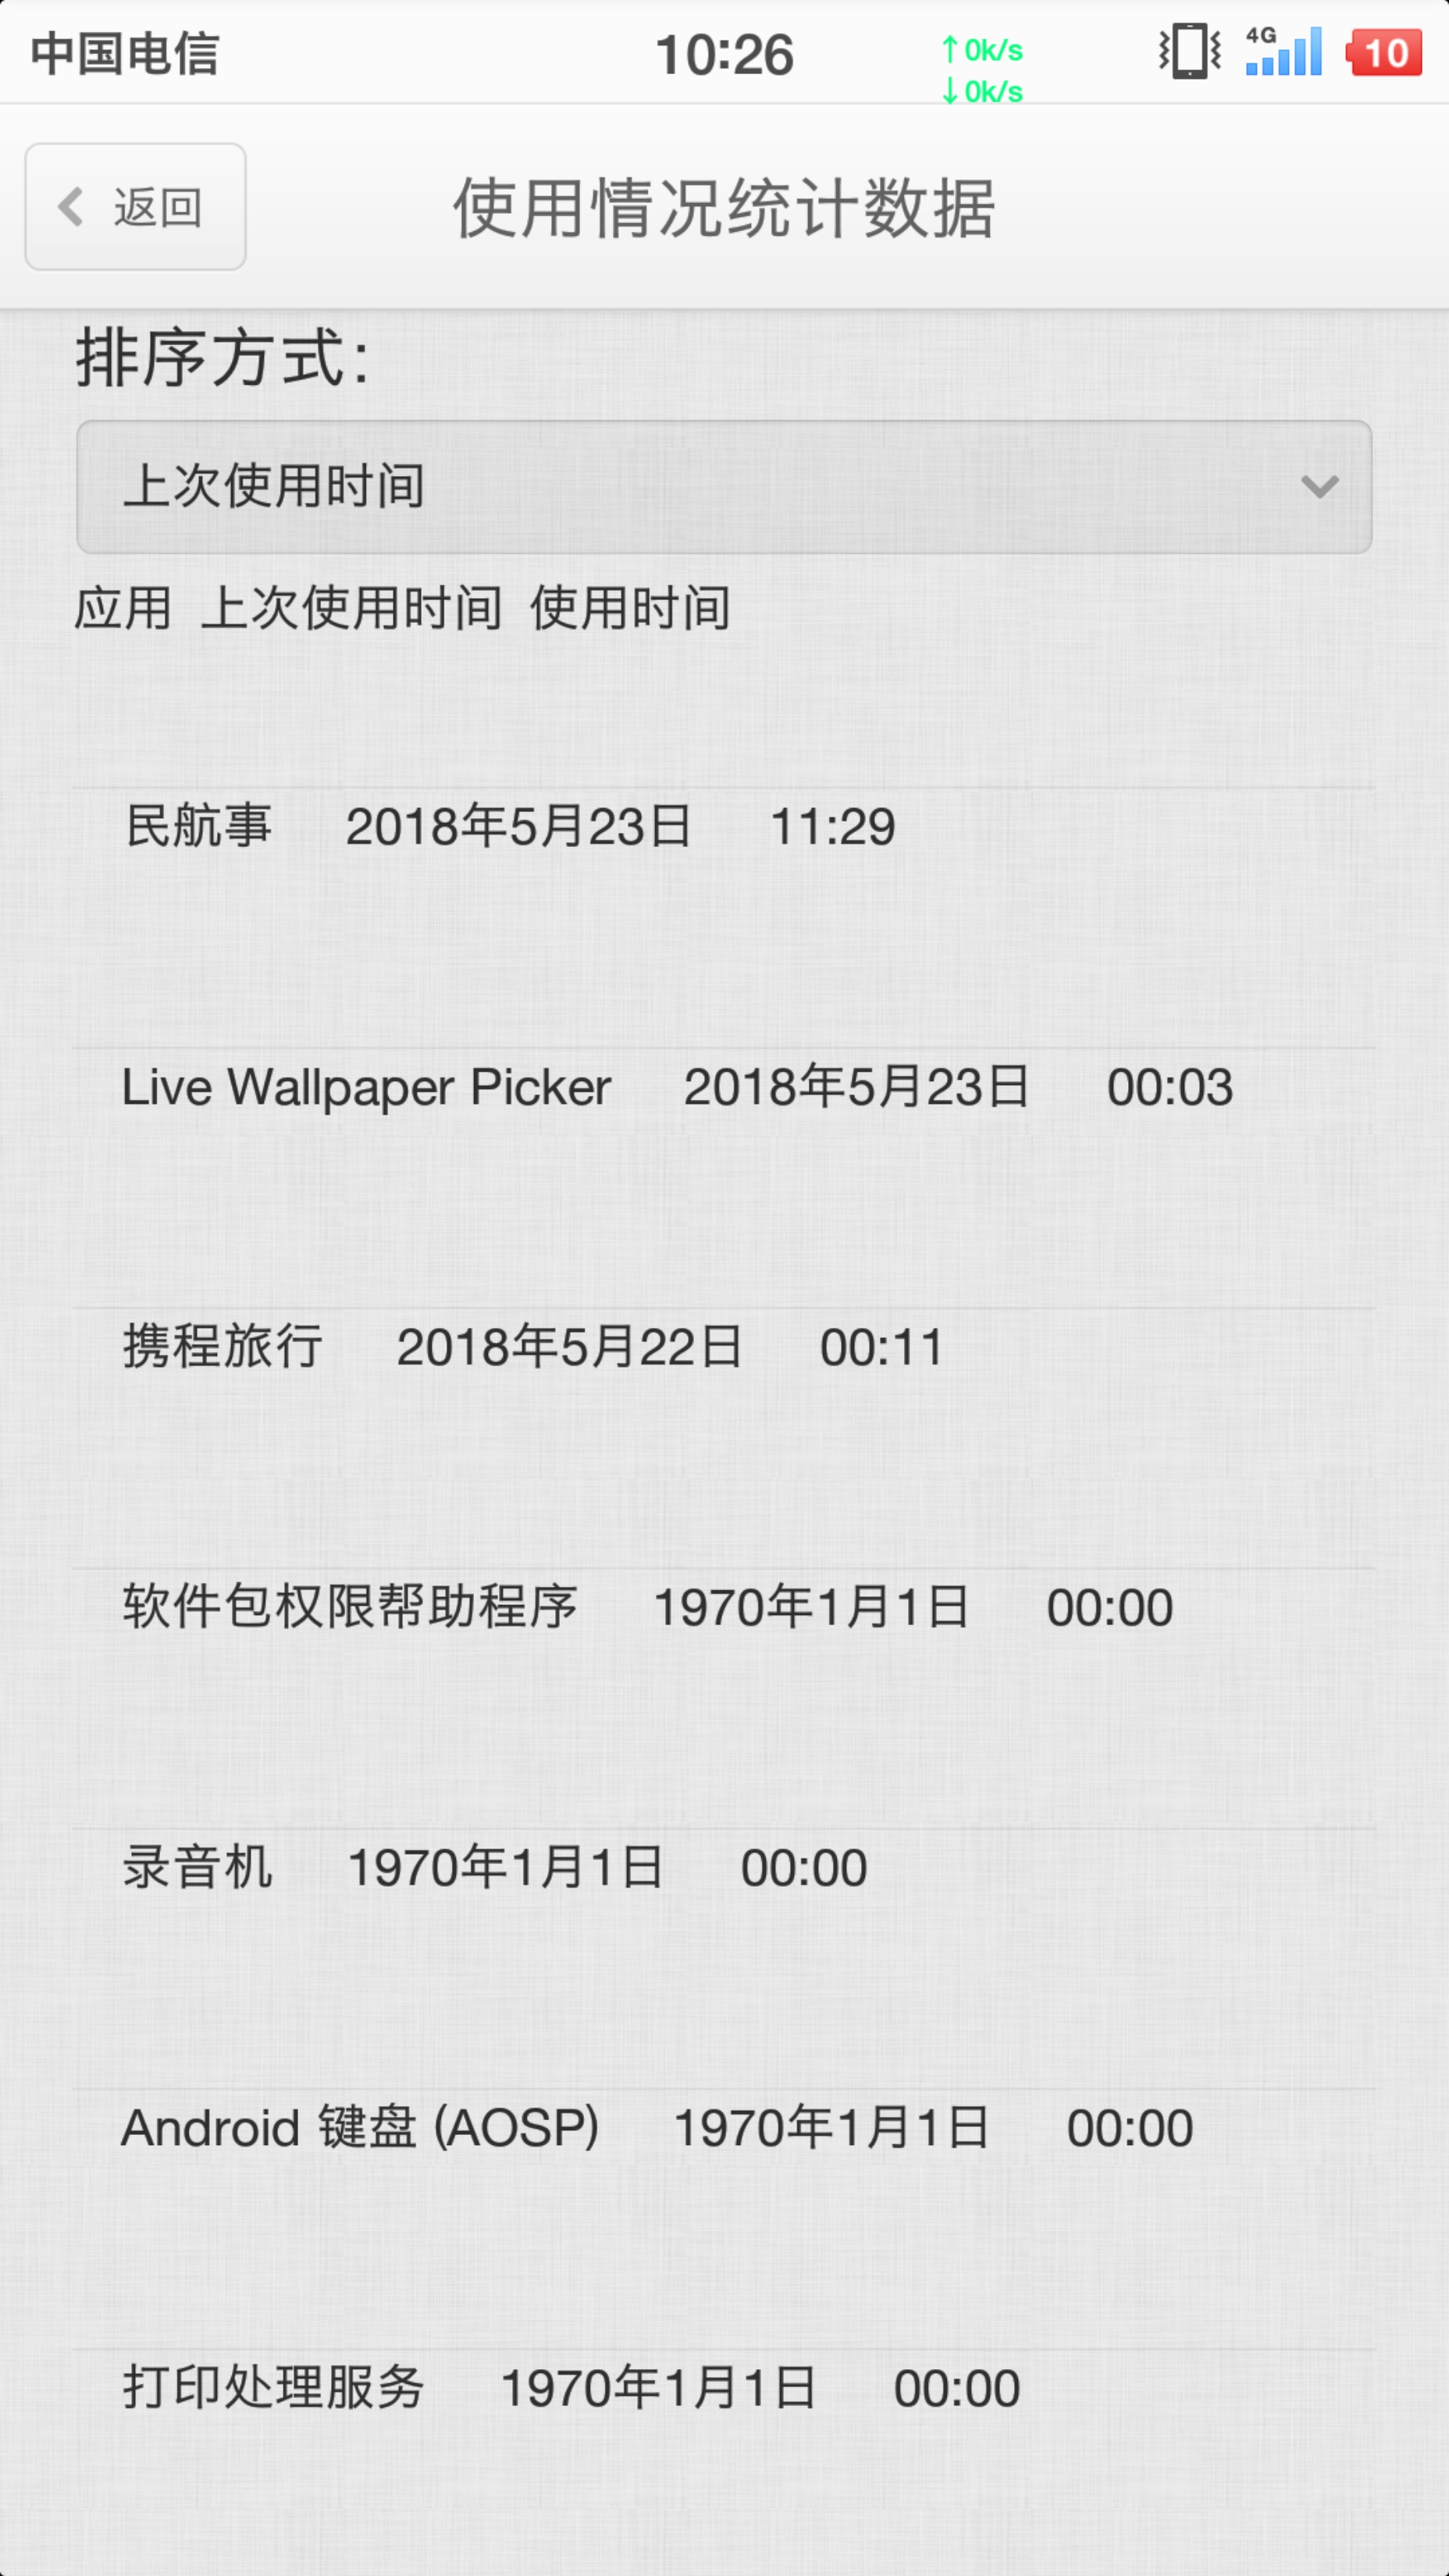 Screenshot_2018-05-27-10-26-45-846_??.png